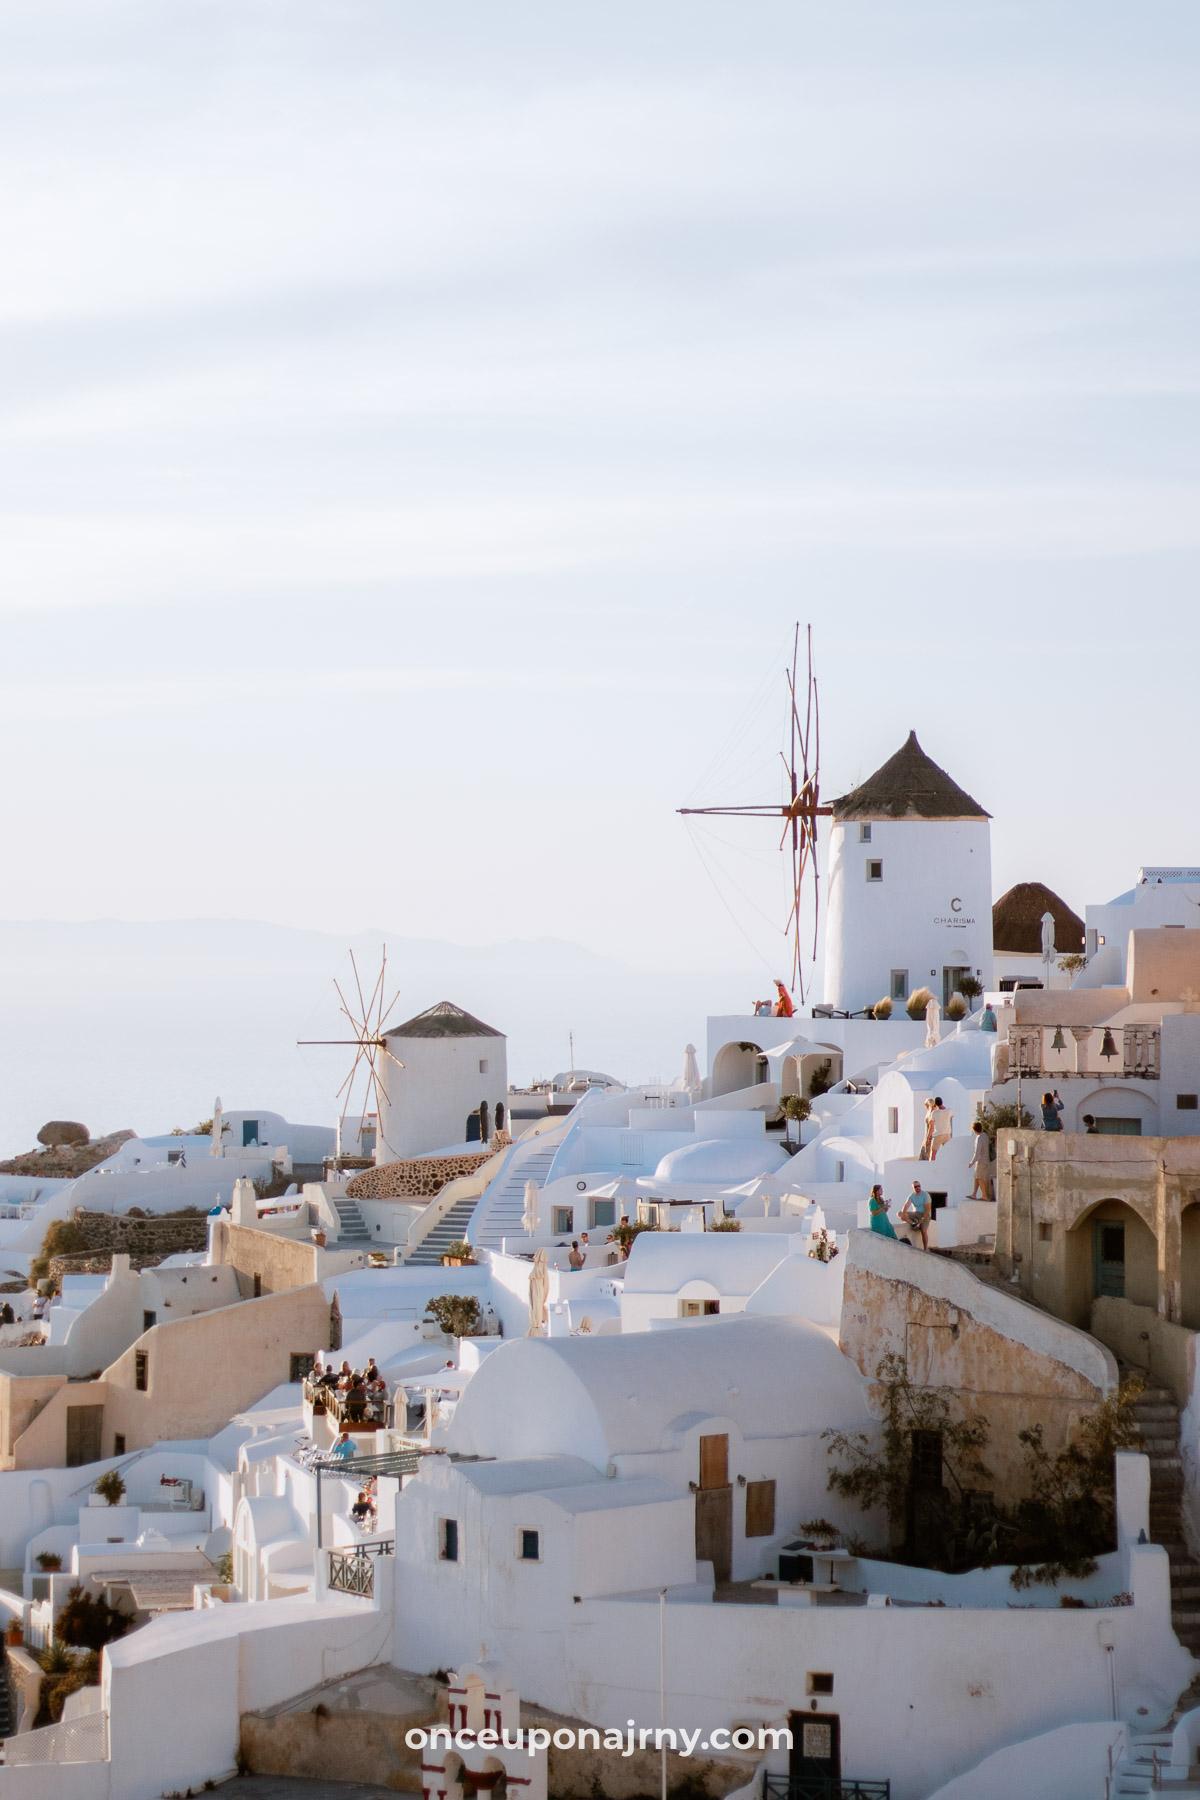 Oia Windmills Santorini photo spots